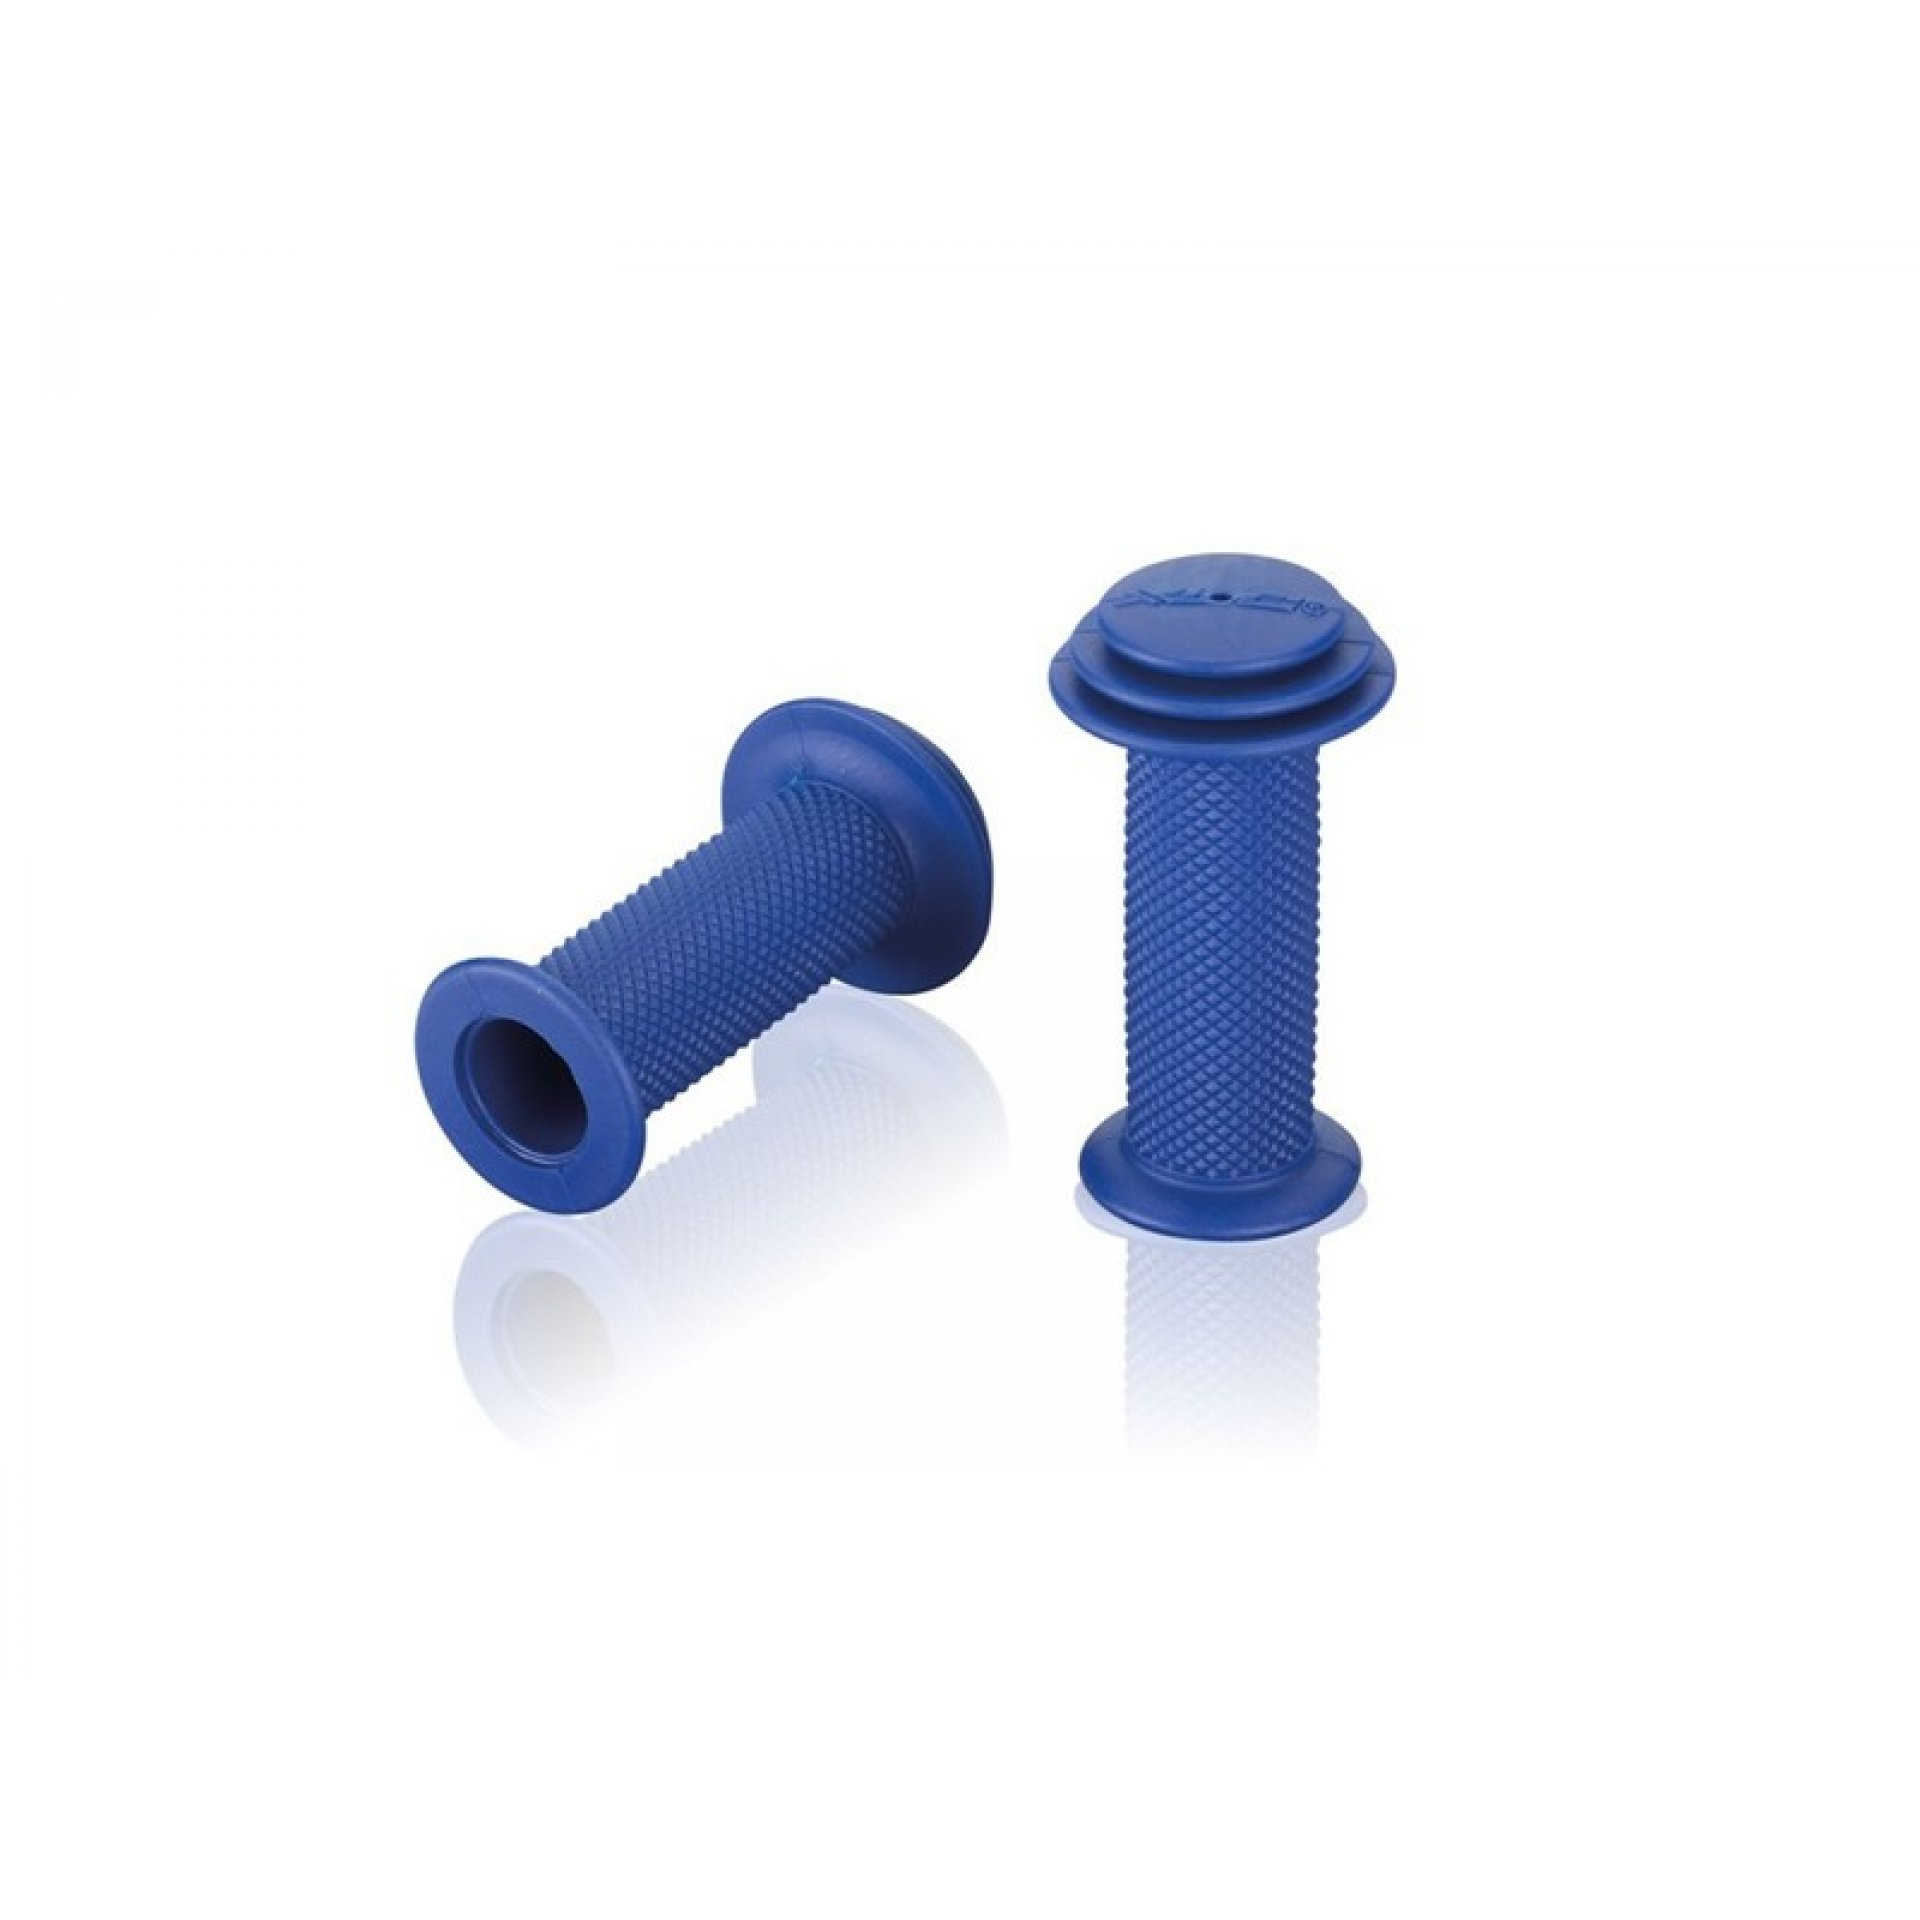 CHWYTY KIEROWNICY ROWEROWEJ XLC GR-G19 82MM BLUE 1